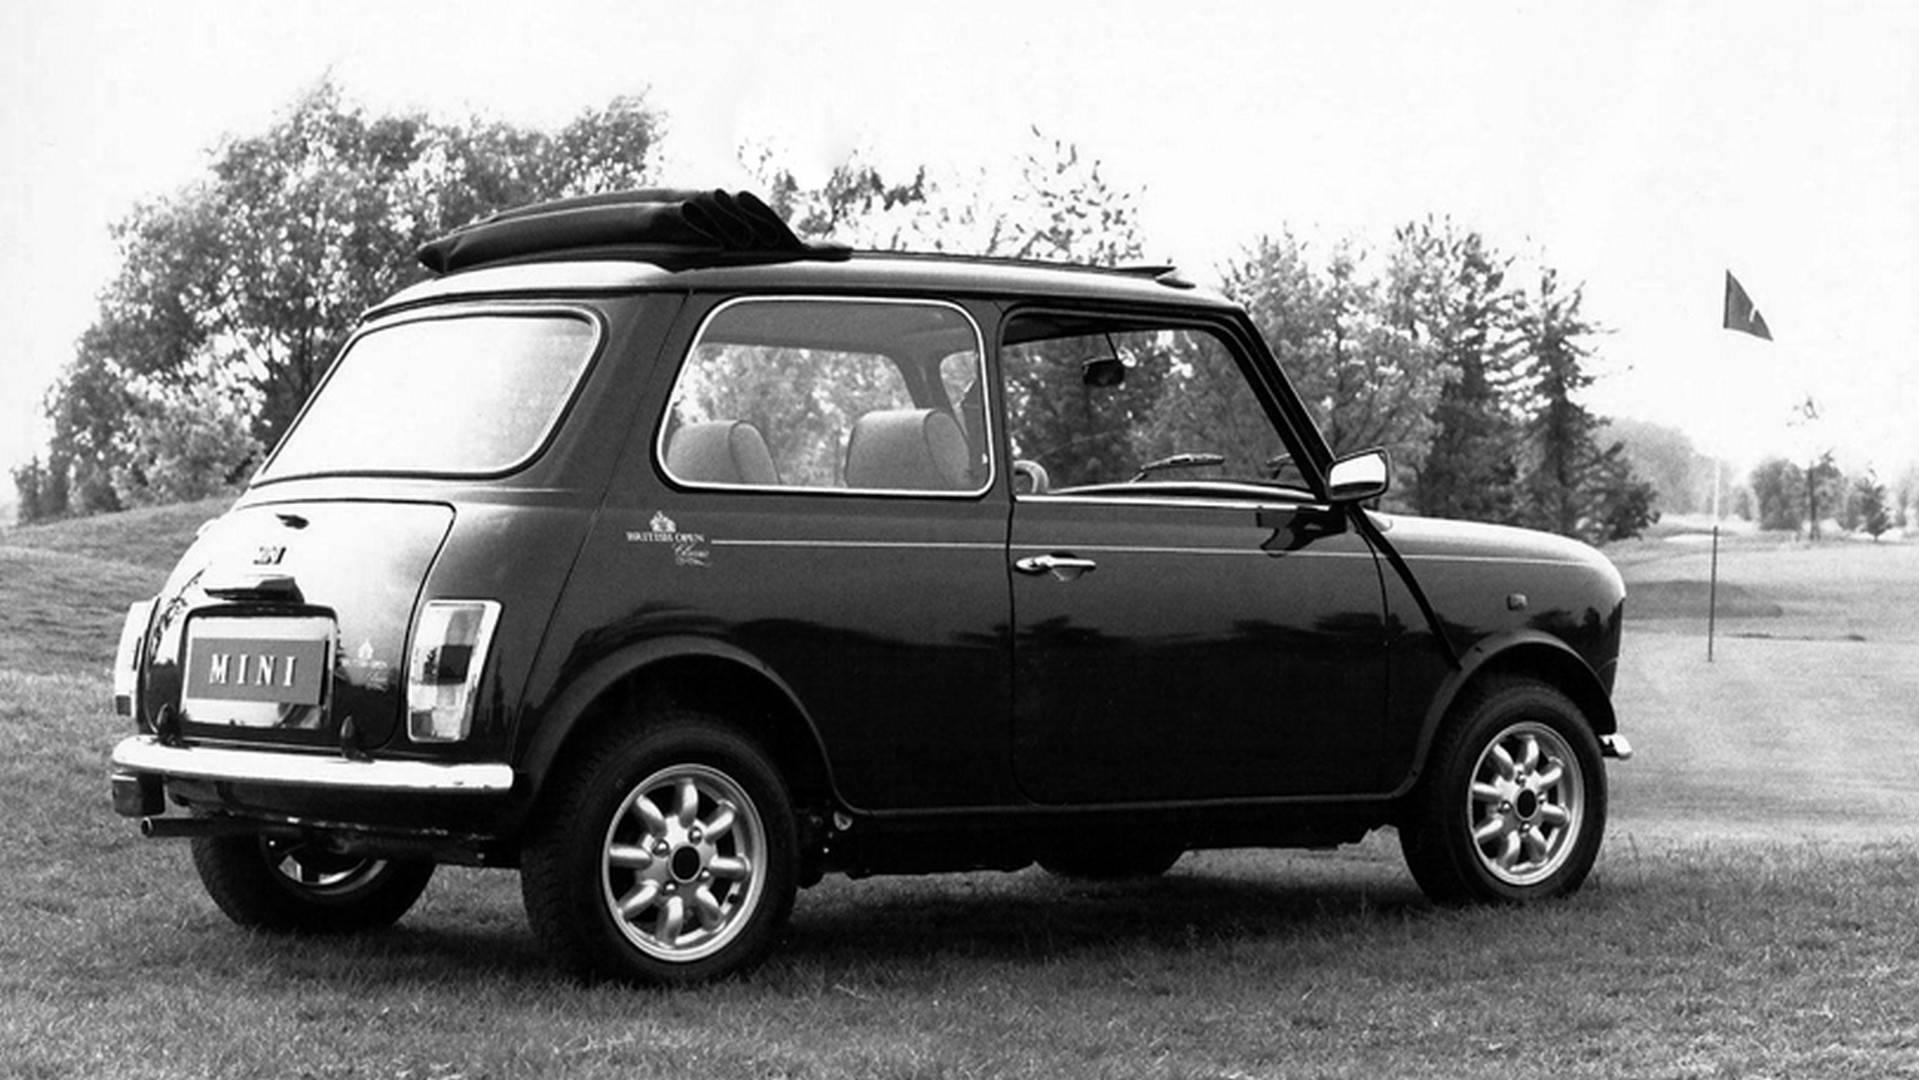 5a94149e483c1 classic mini through the years چرا ما کلاسیک مینی را دوست داریم   اجاره ماشین